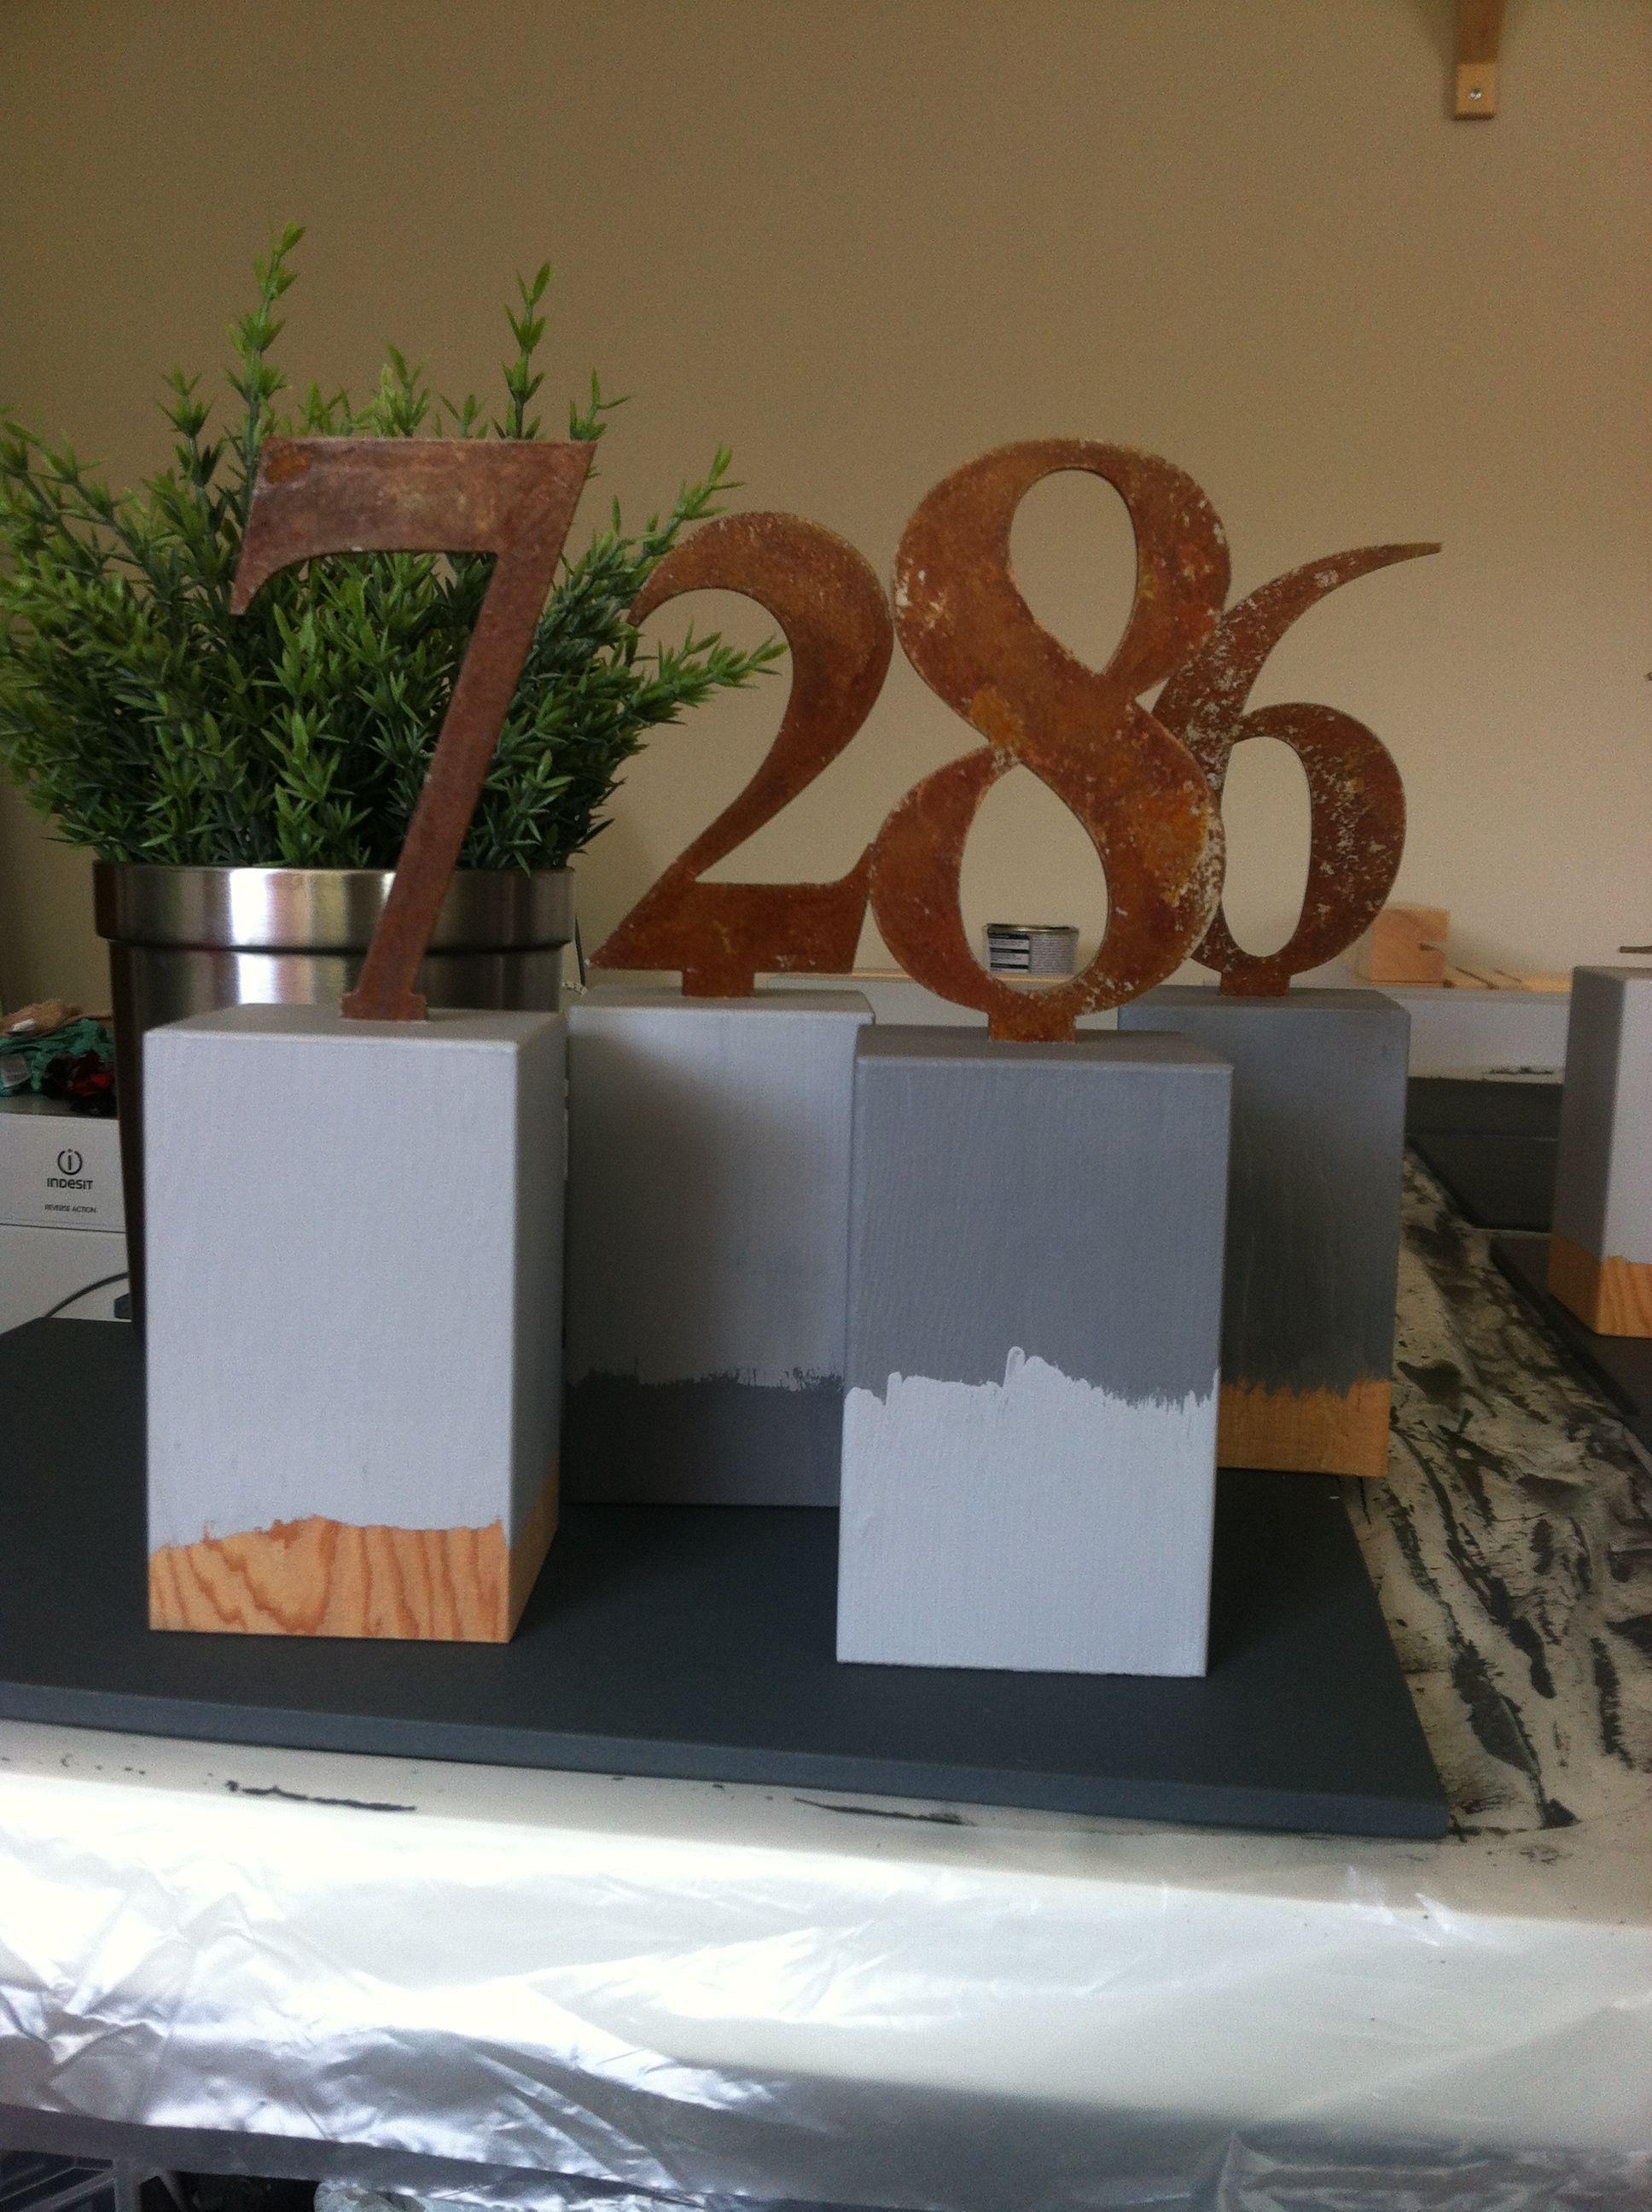 Interior design ideas cafe bar decor rustic diy handmade table